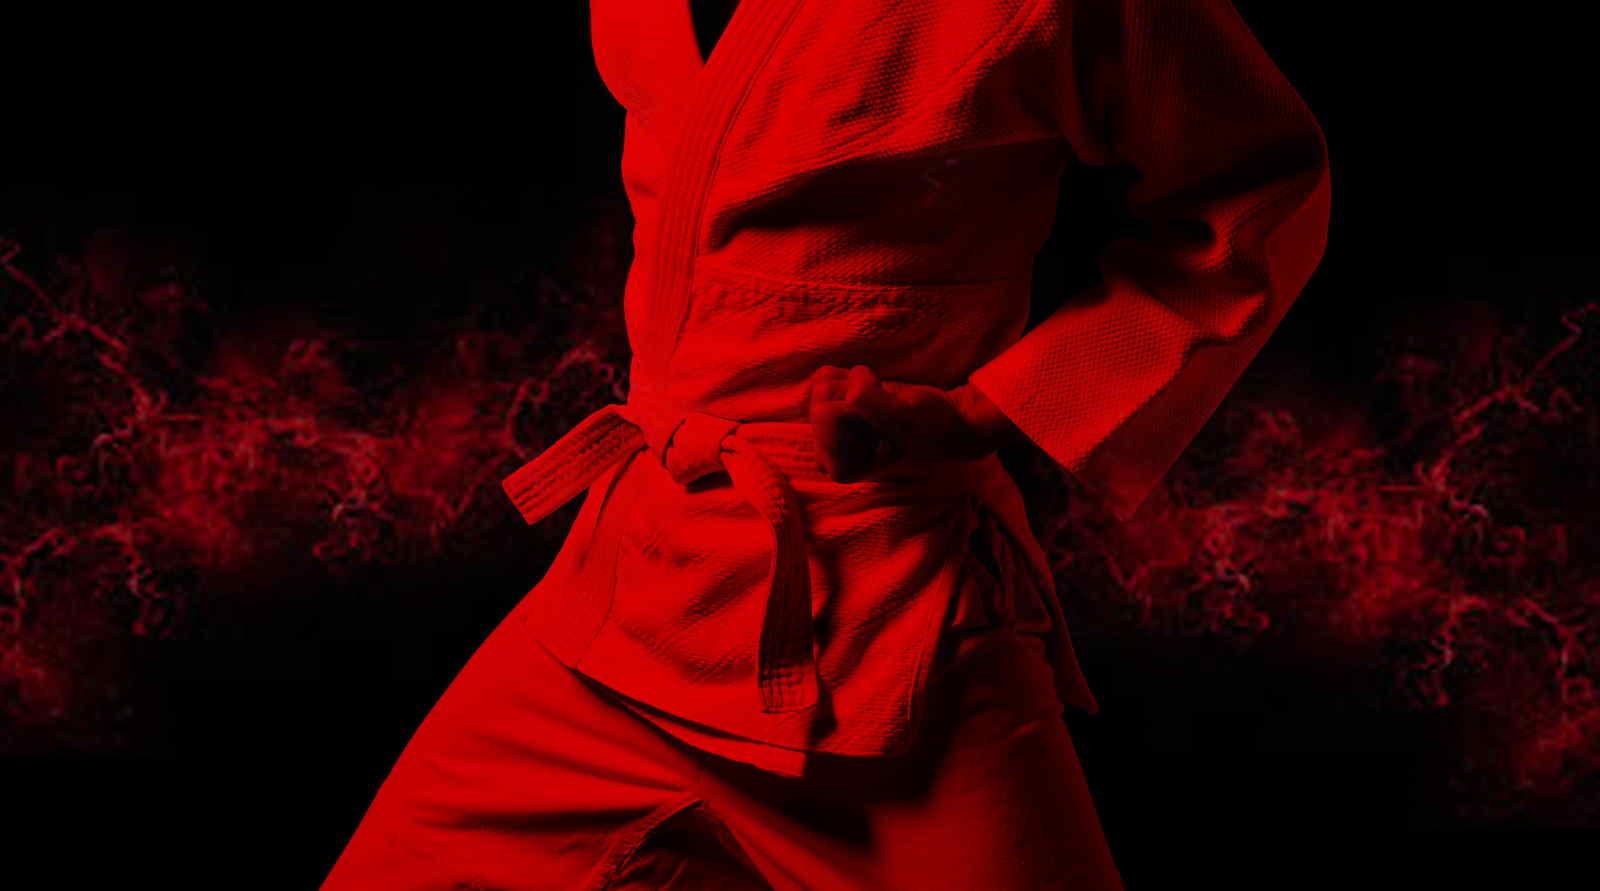 پروفایل کاراته قرمز با رنگ پس زمینه دیدنی